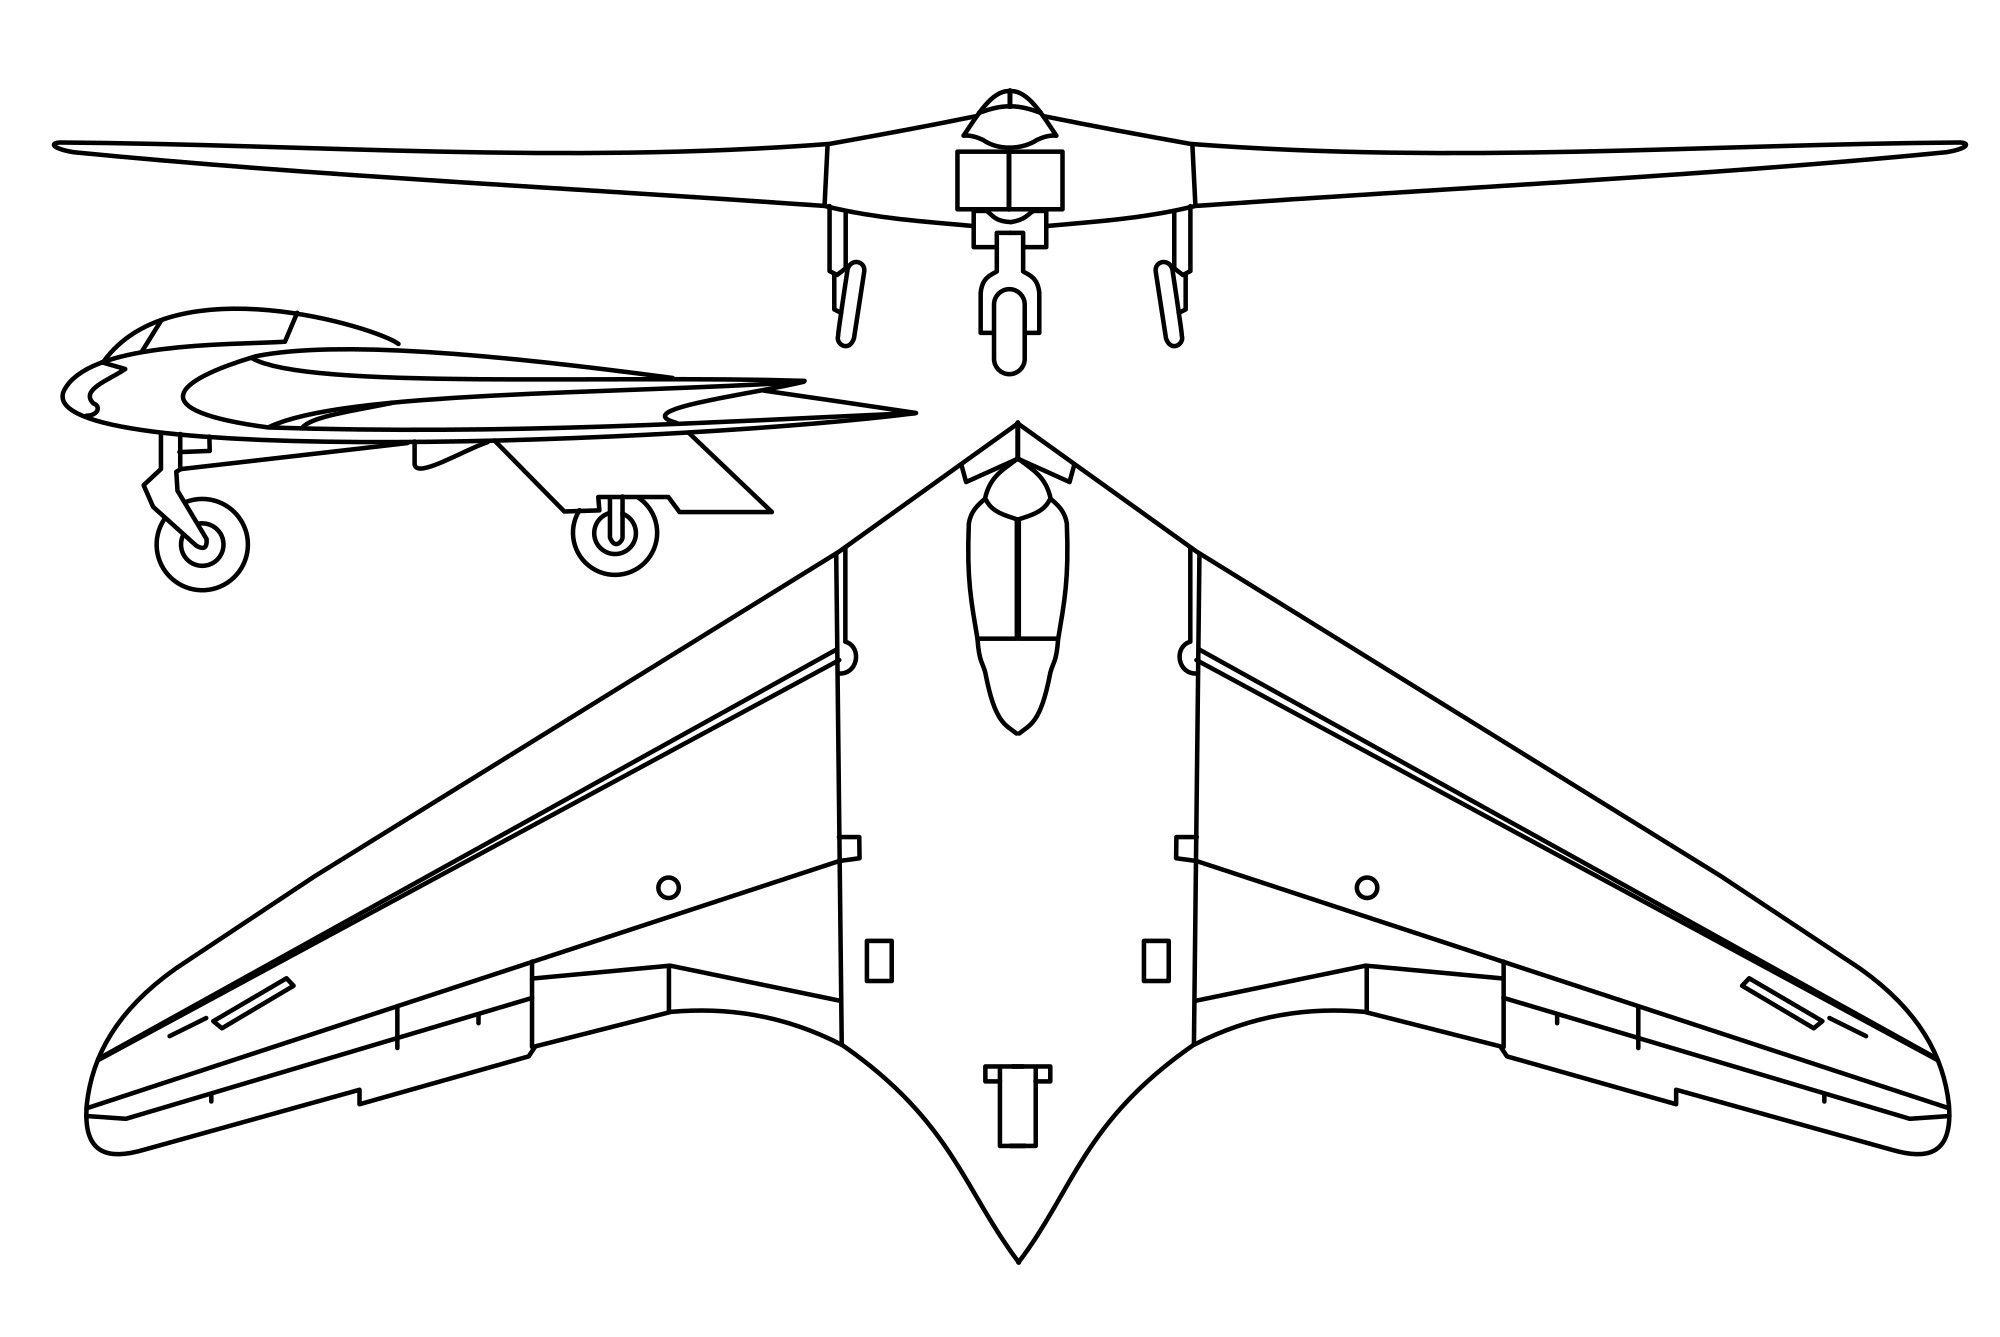 H.IX V1 drawings.